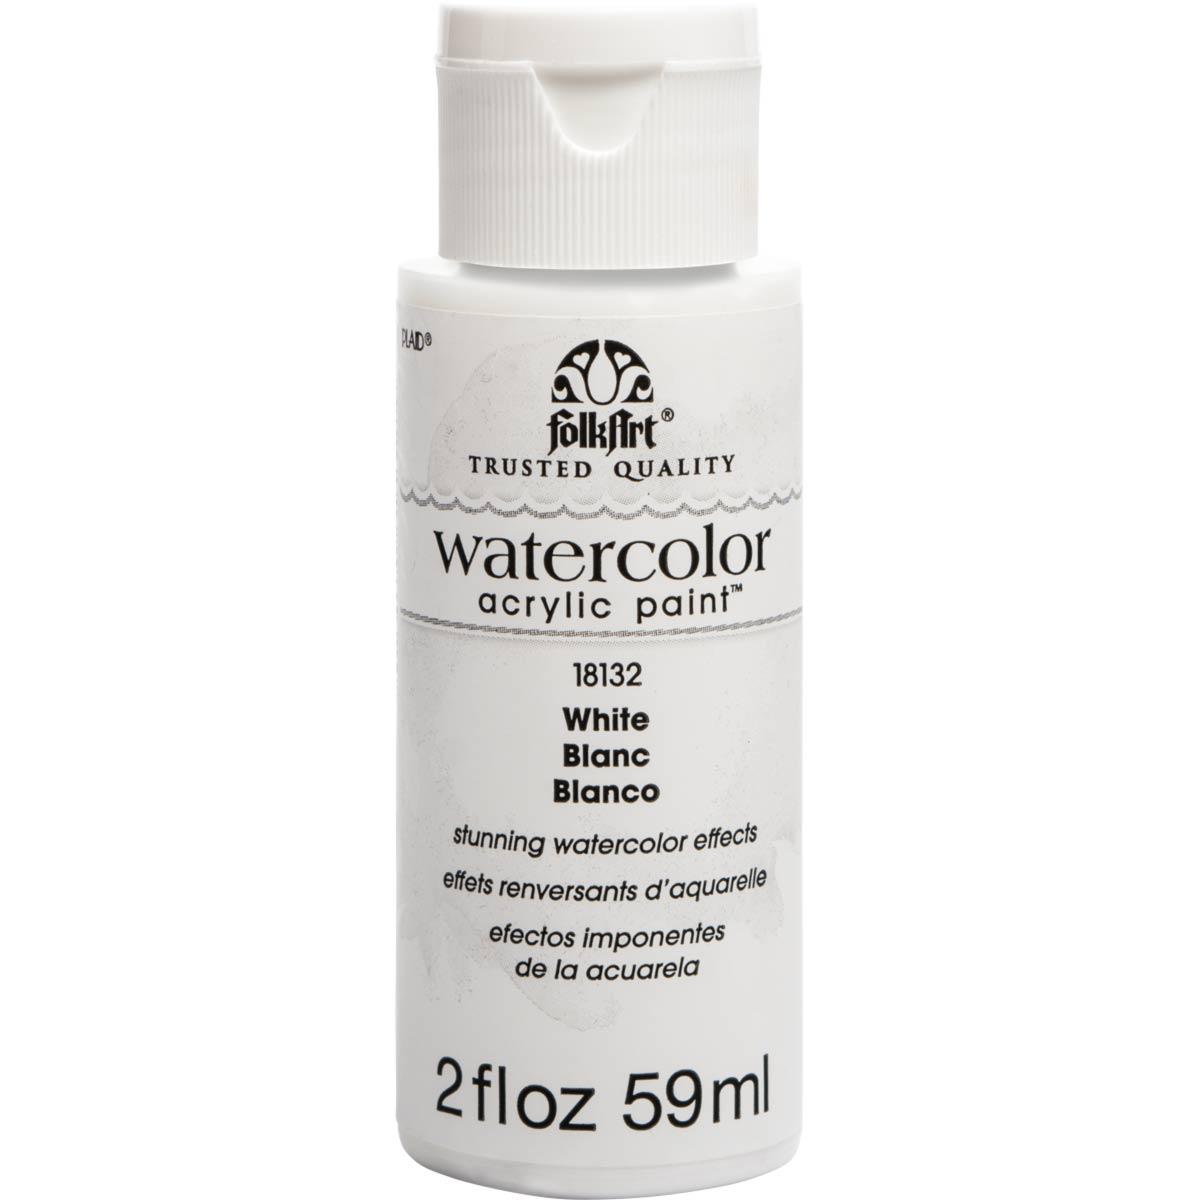 FolkArt ® Watercolor Acrylic Paint™ - White, 2 oz. - 18132